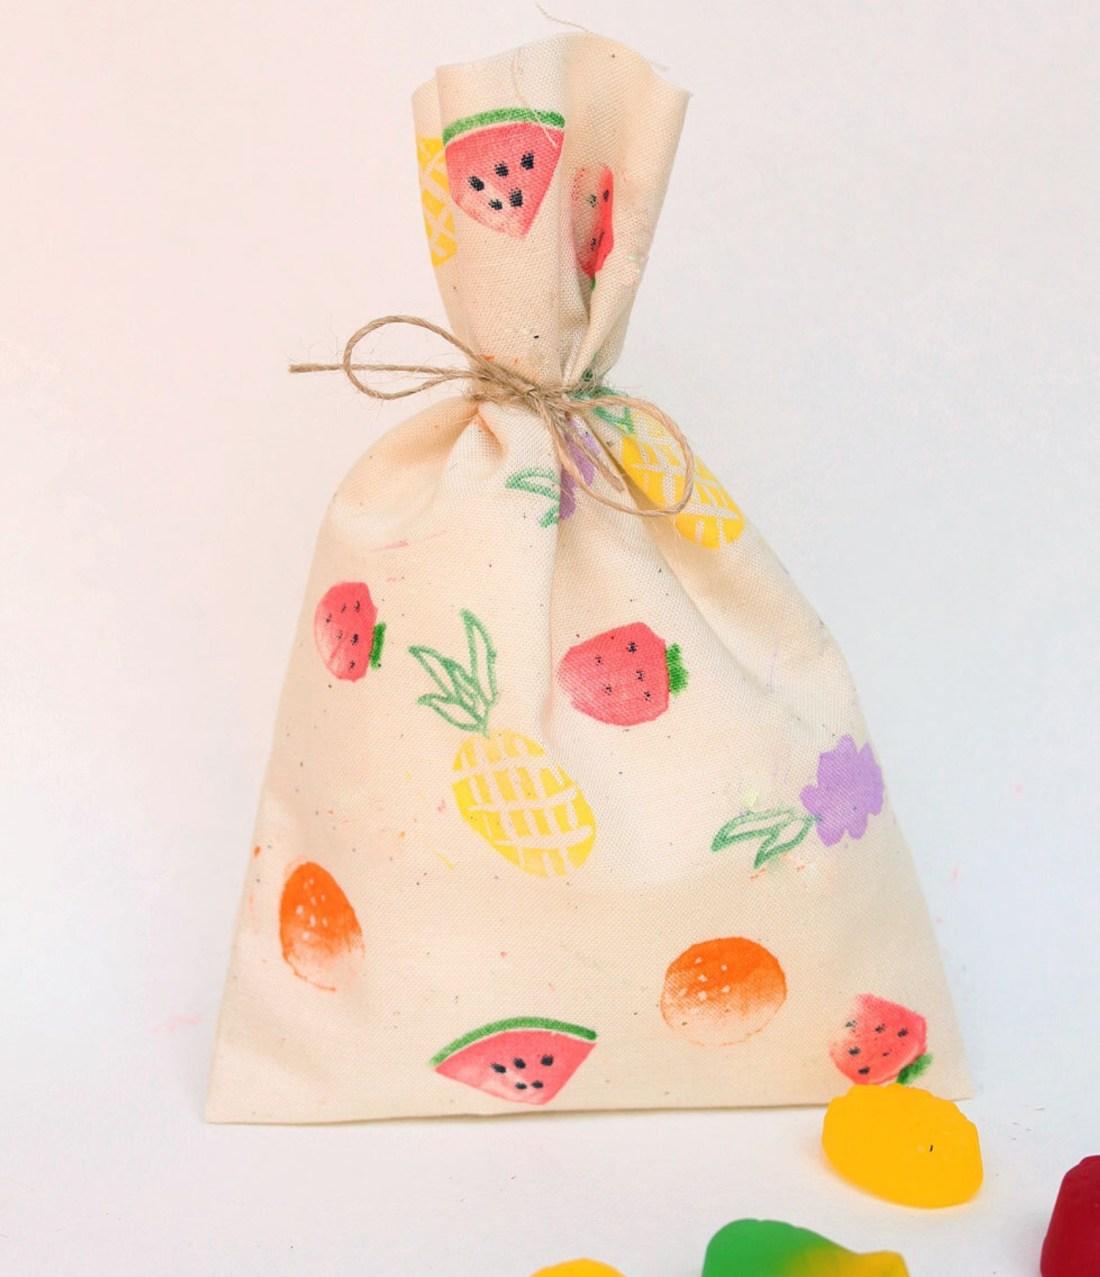 Tutti frutti favour bags